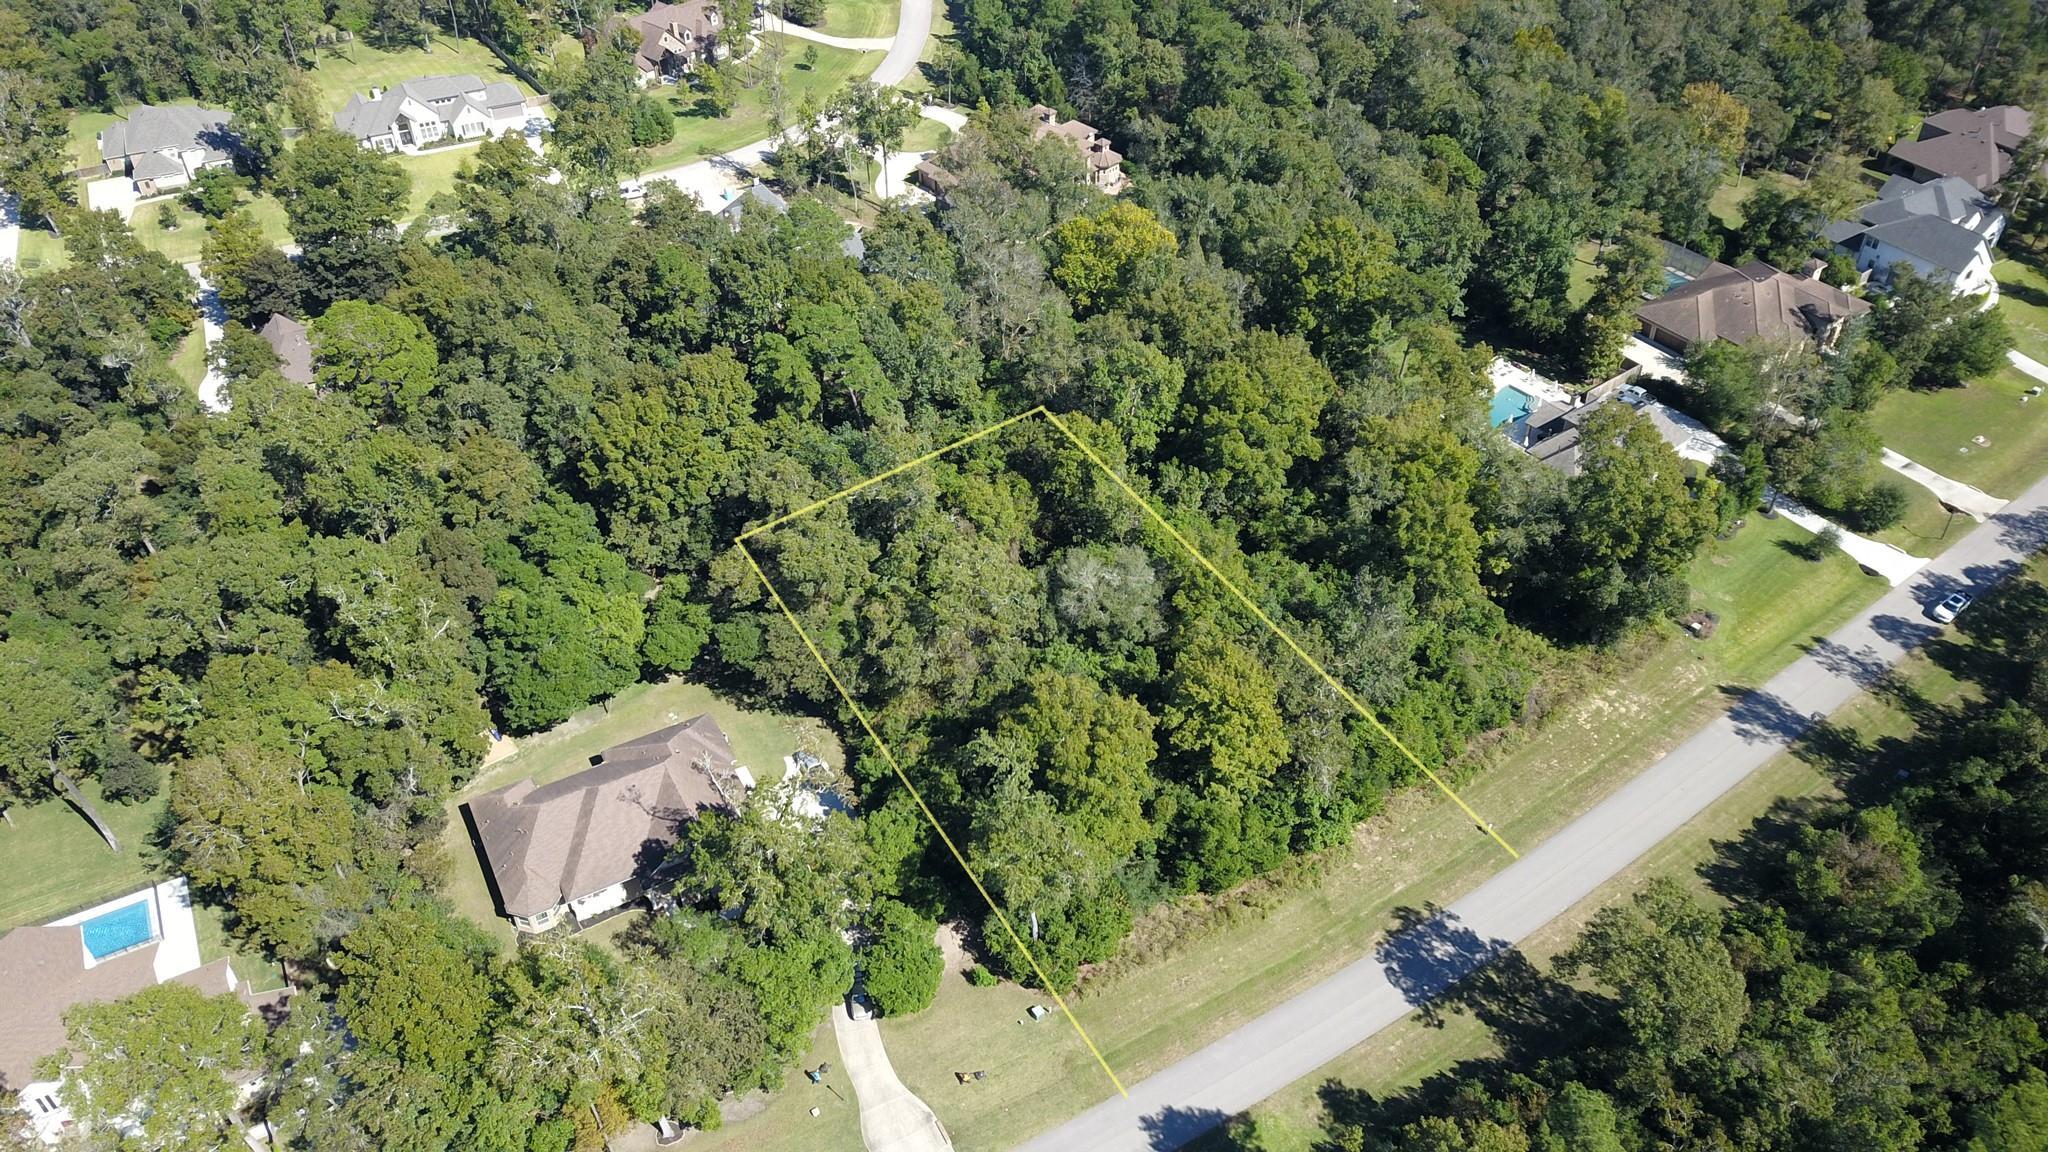 27319 Shady Hills Landing Ln Property Photo - Sring, TX real estate listing